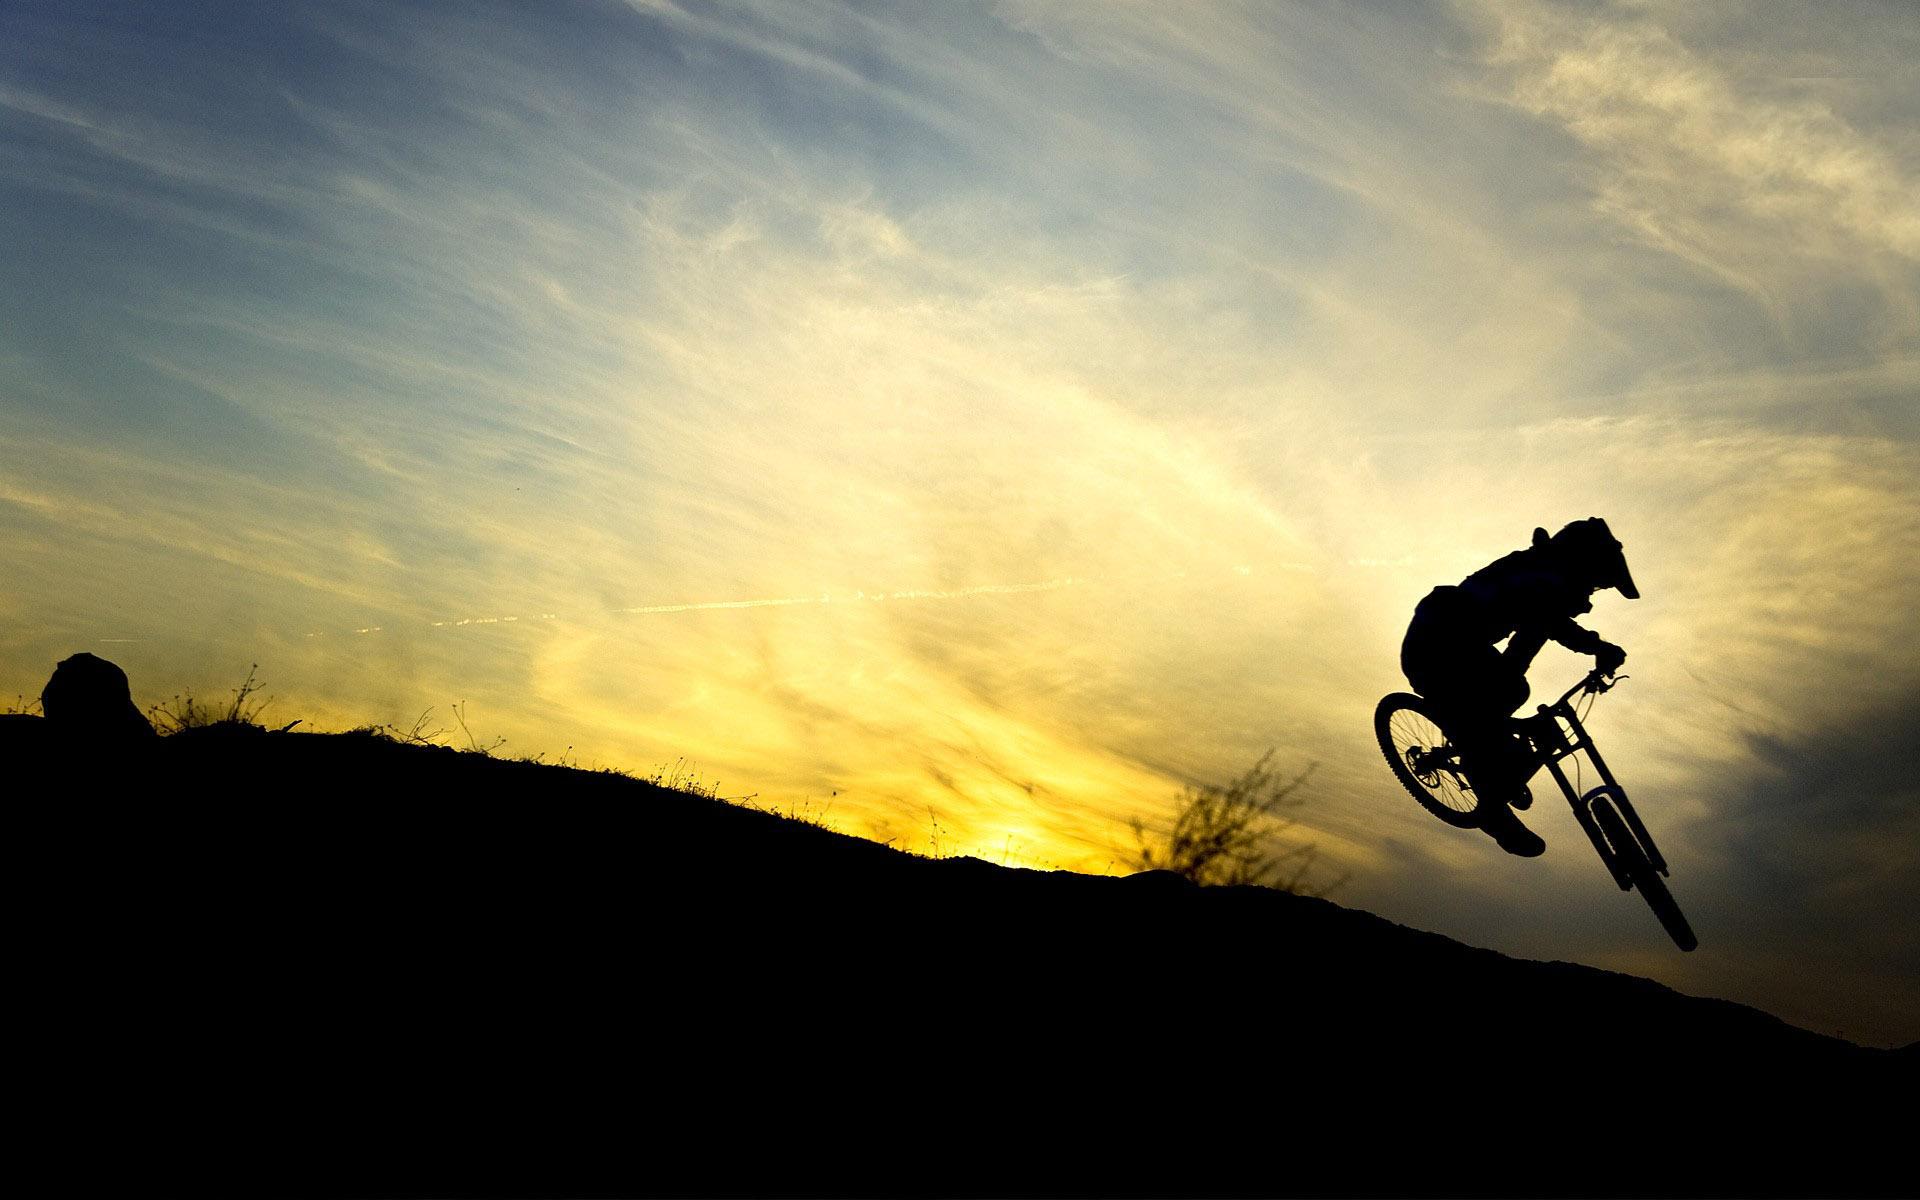 downhill-biker-silhouette-15756